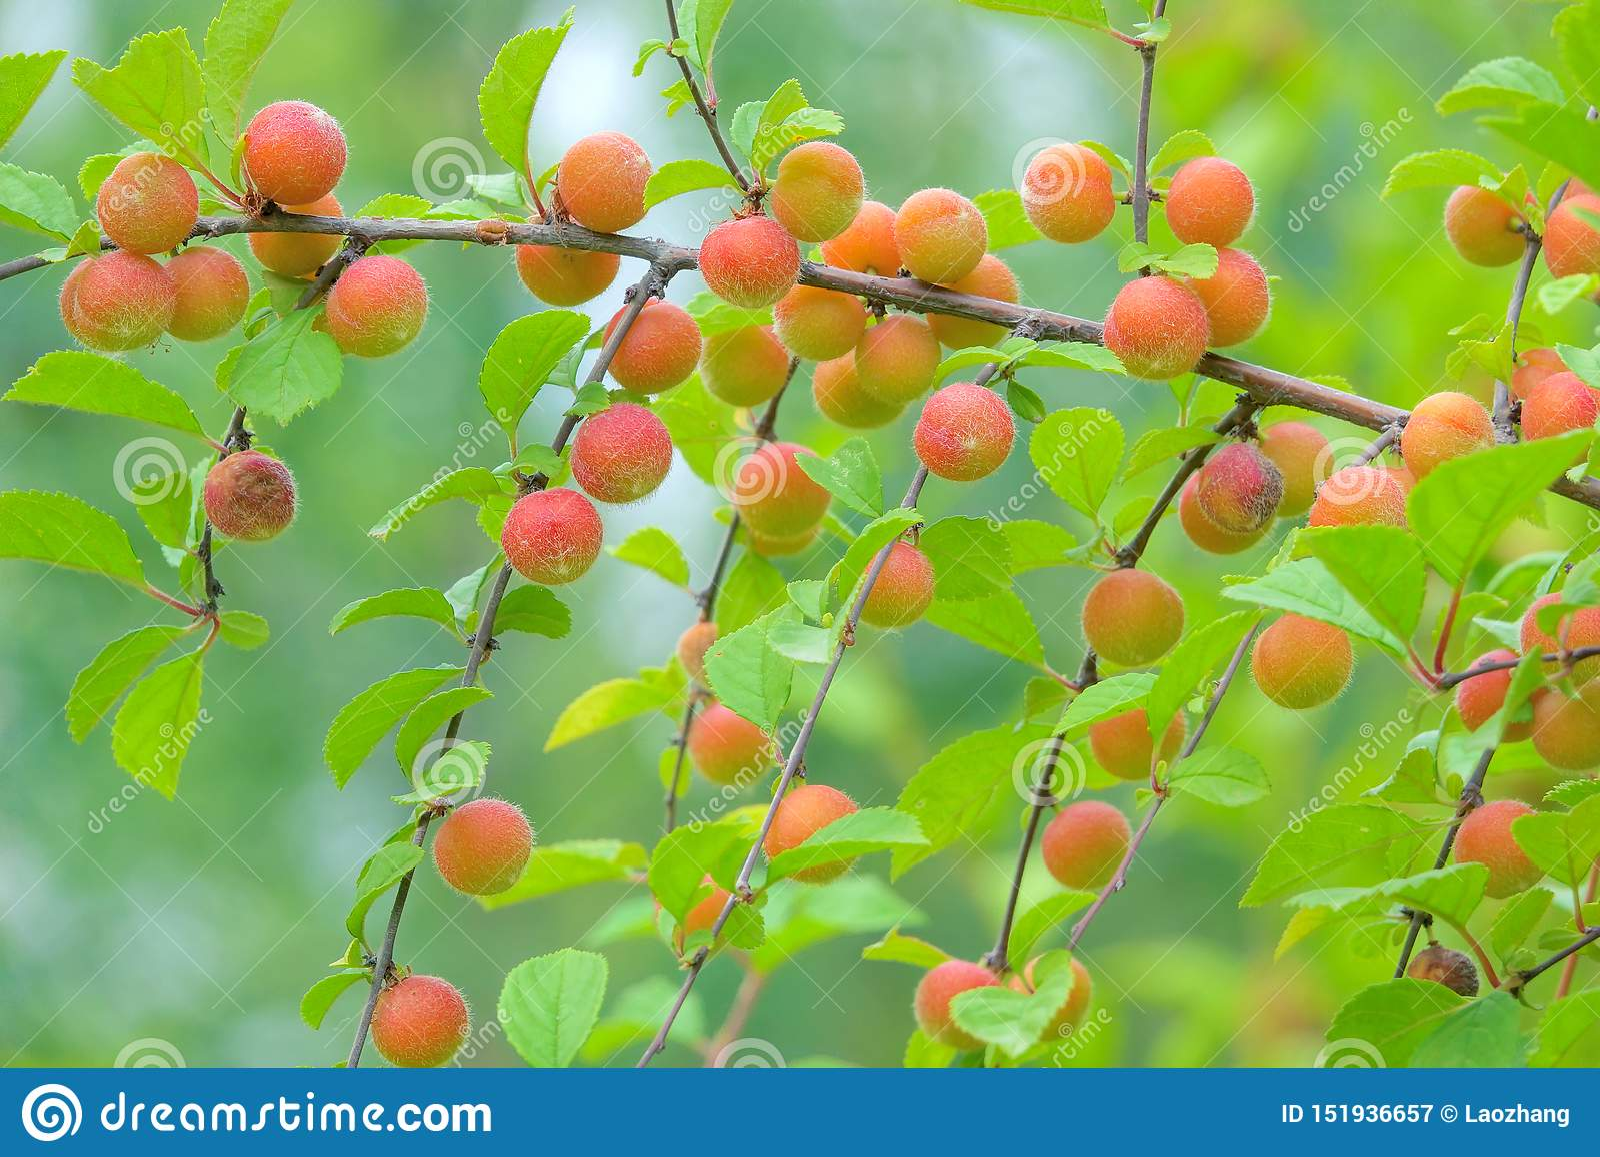 Fruits Of Flowering Plum Stock Image Image Of Wild 151936657